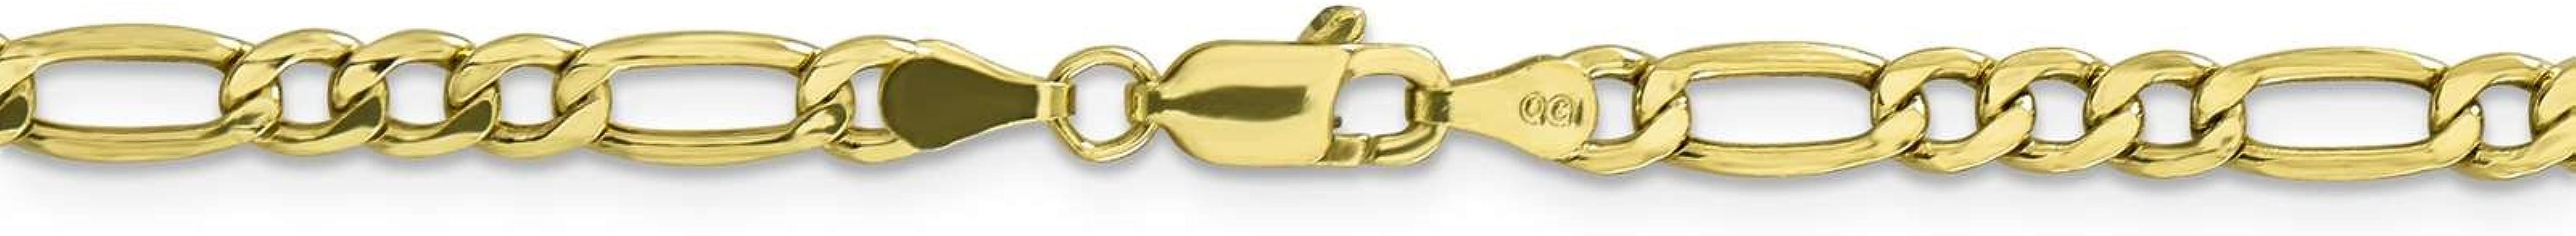 BR062 3-10pcs Amethyst Druzy Quartz Pendant,Gold Plated Nature Druzy Drusy Quartz Crystal Pendant for Making necklaces jewelry findings